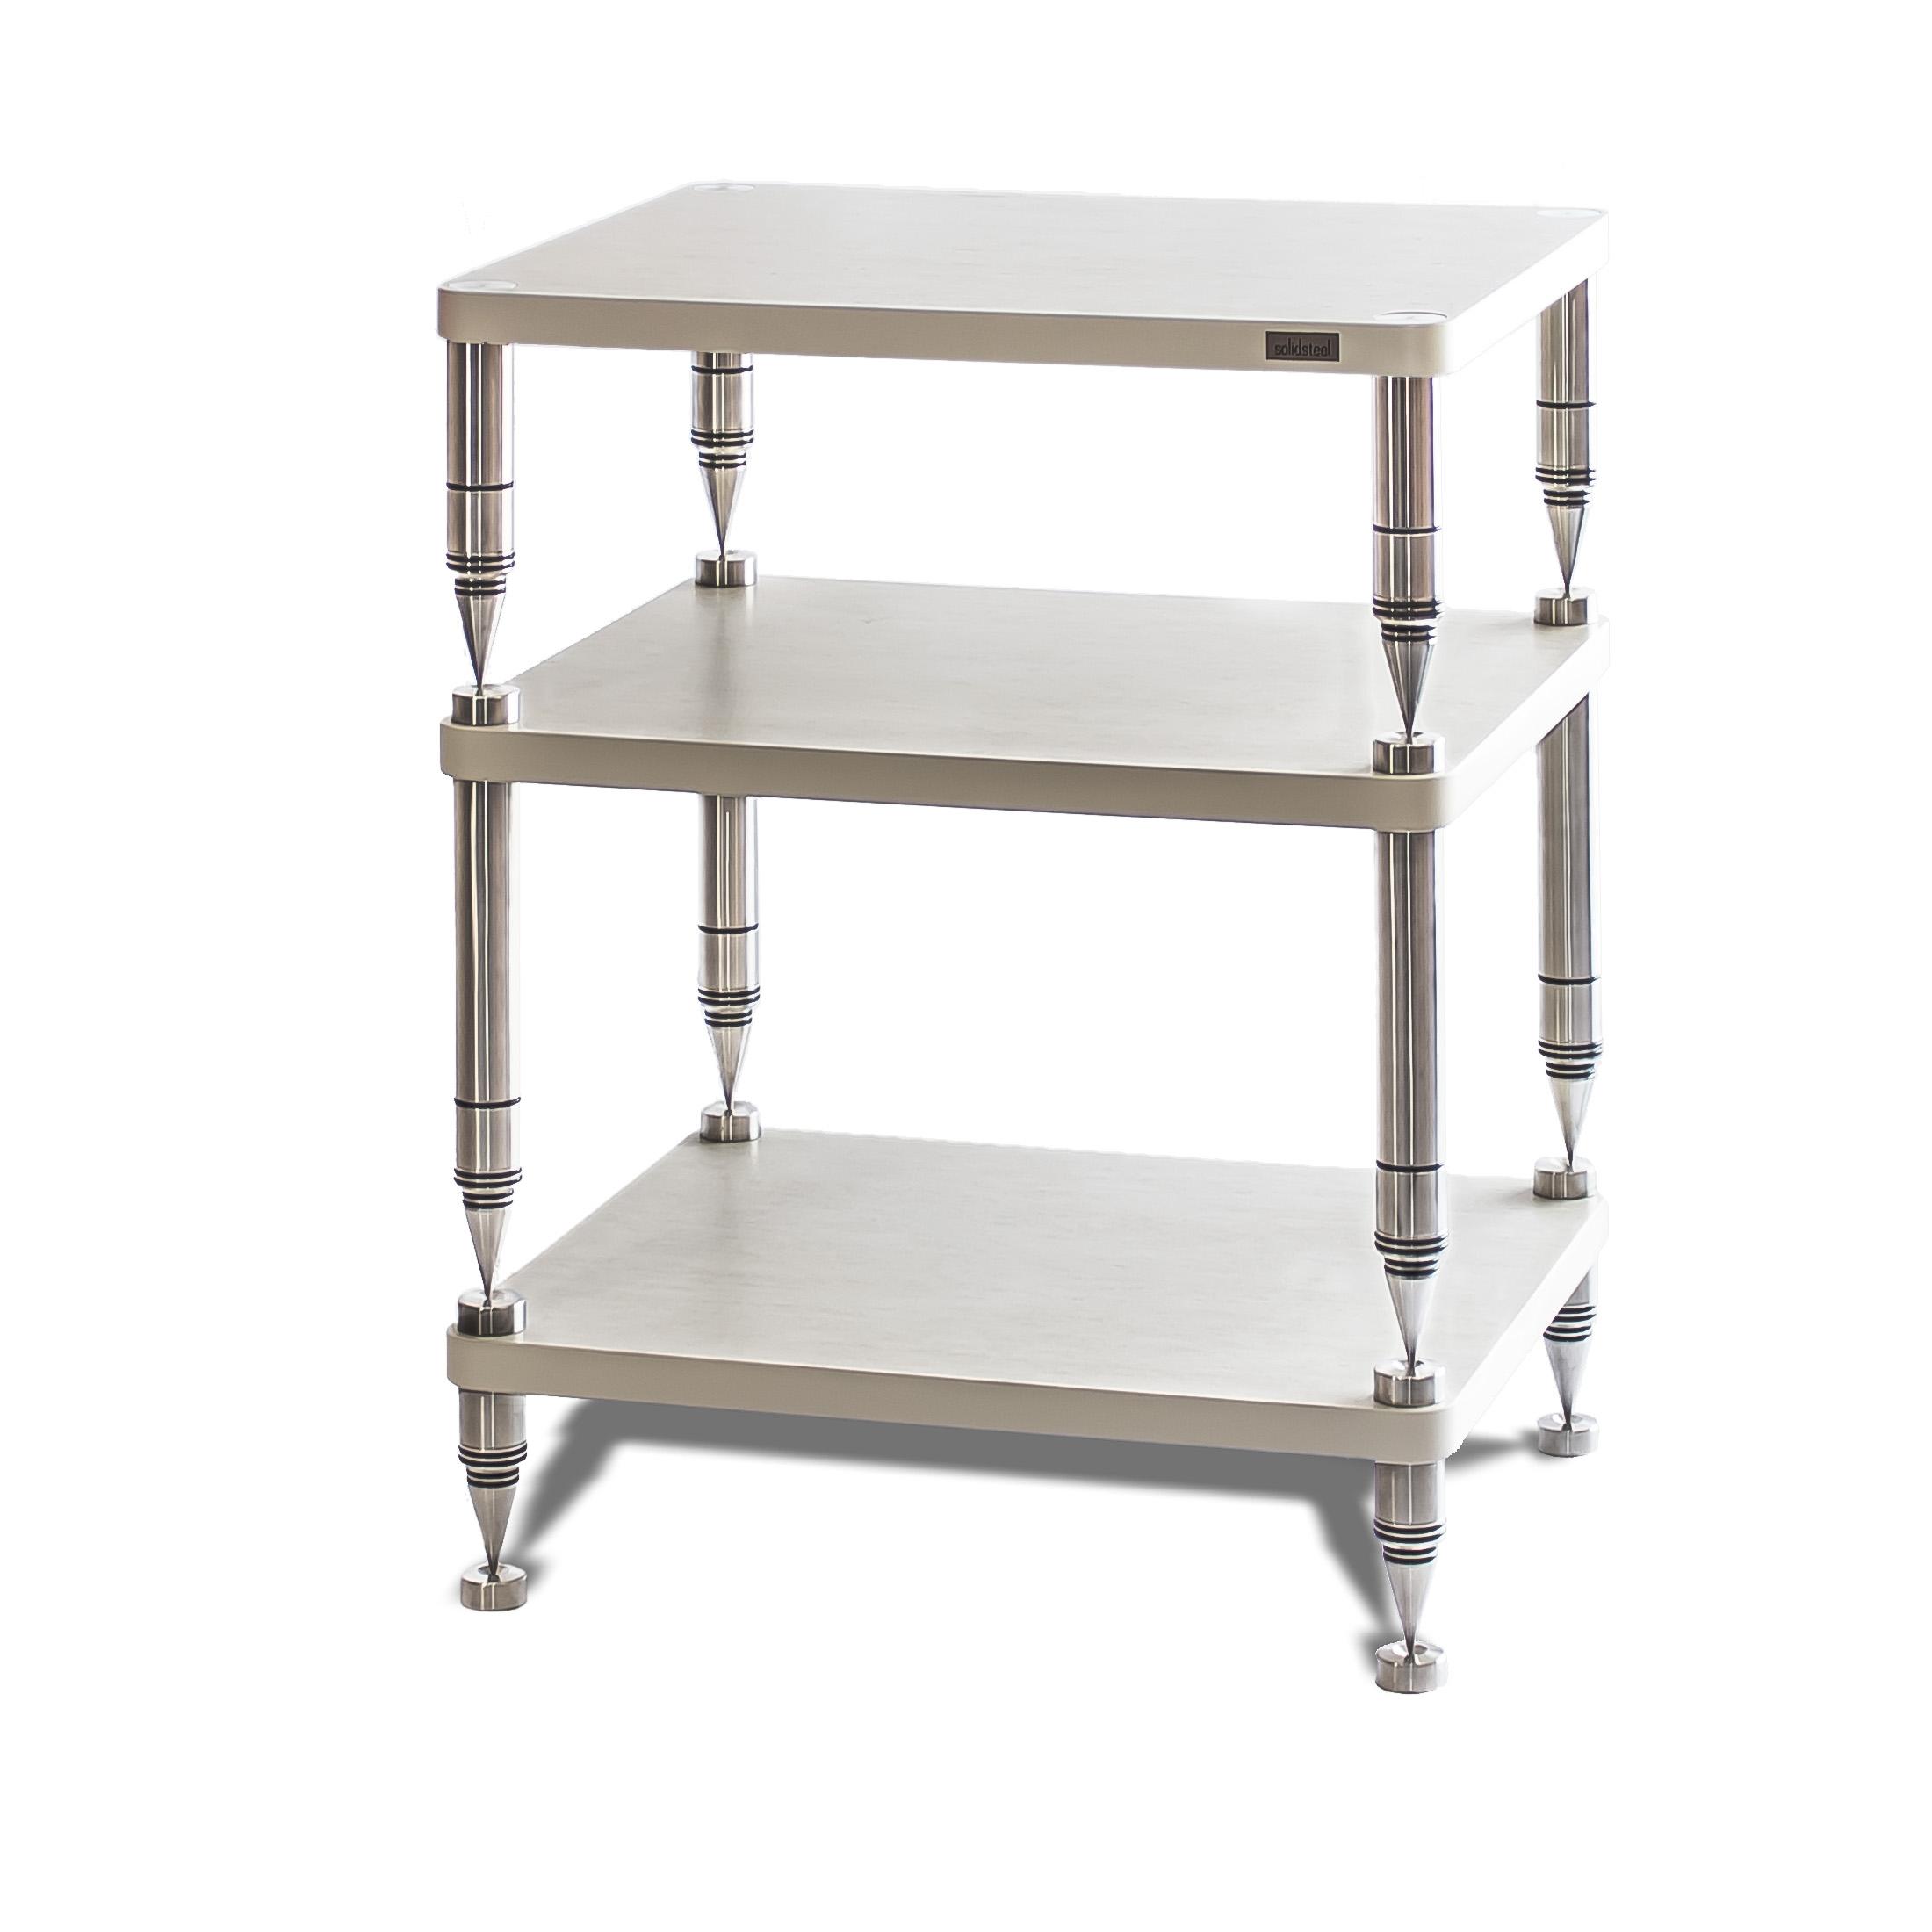 using new rack tables regal of audio lack ikea appraisal build hifi diy fi hi racks a